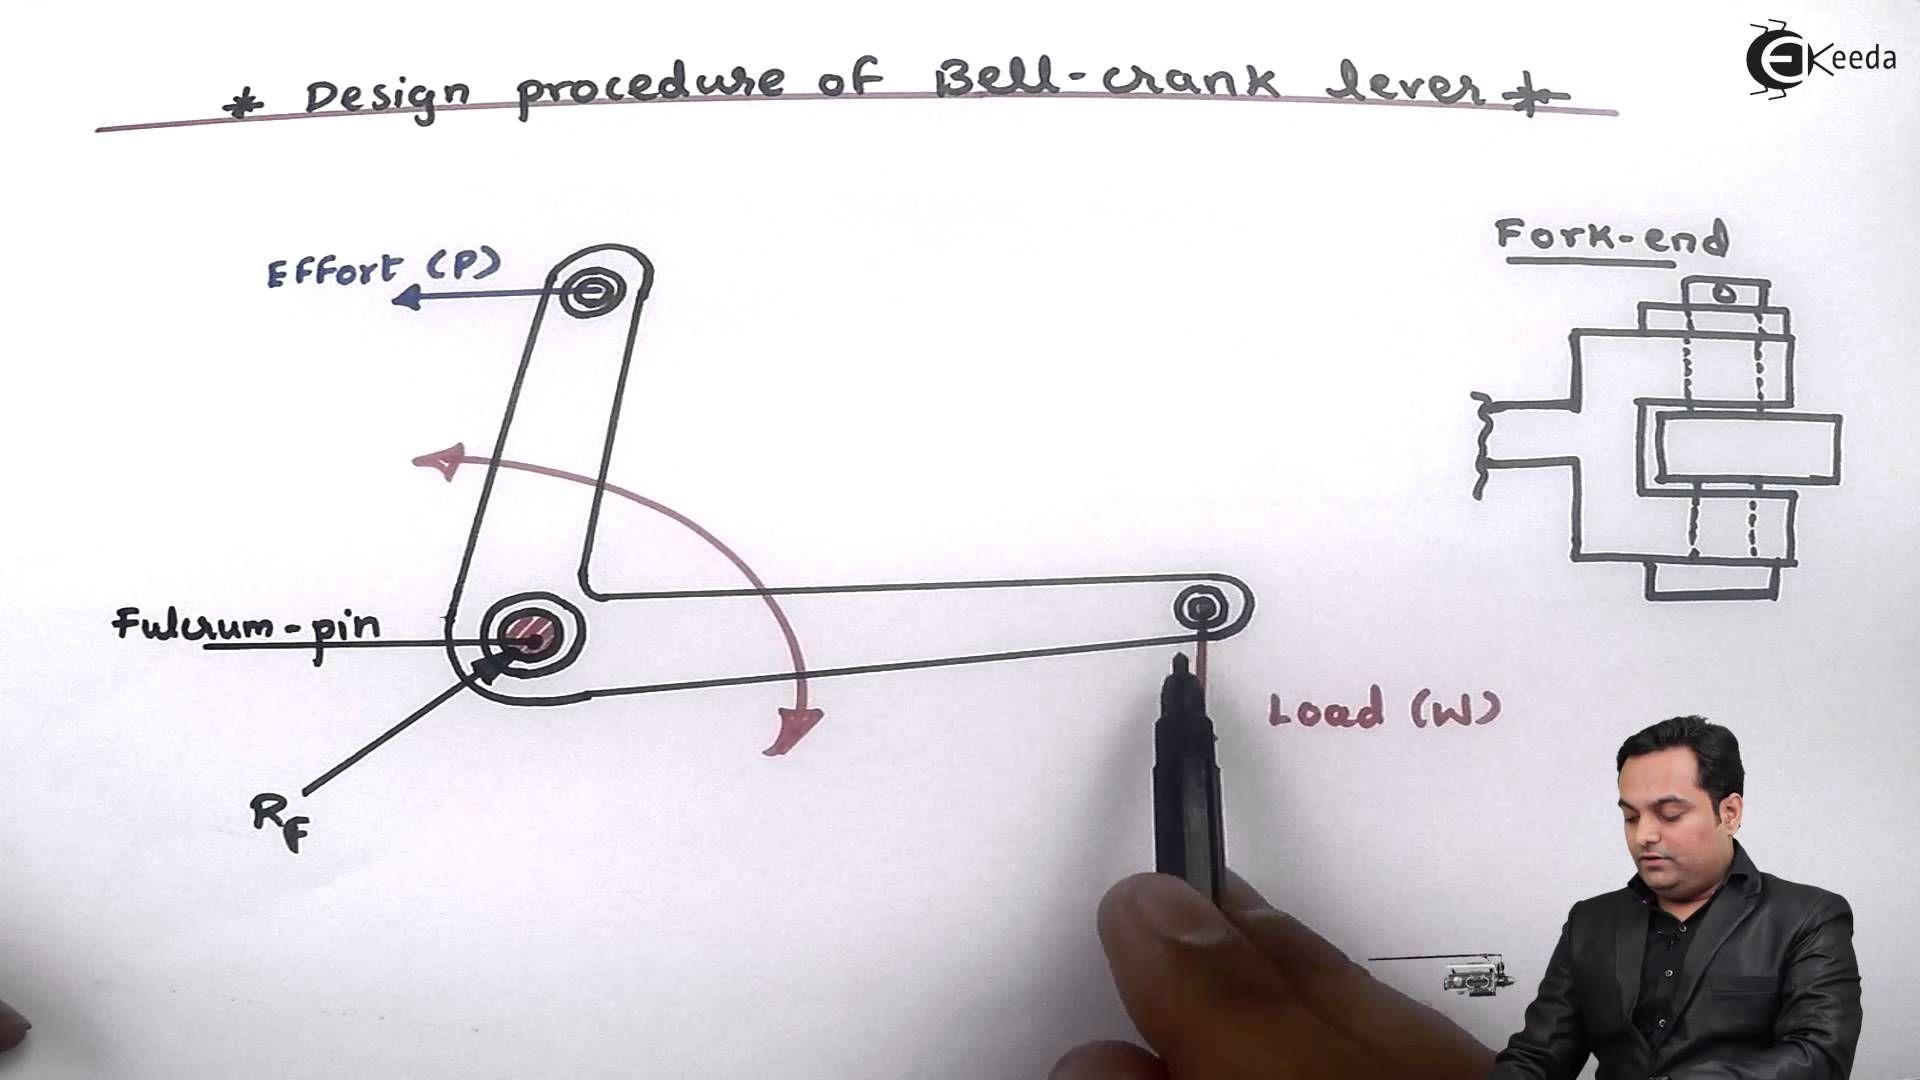 Bell Crank Lever Design : Learn design procedure of bell crank lever video